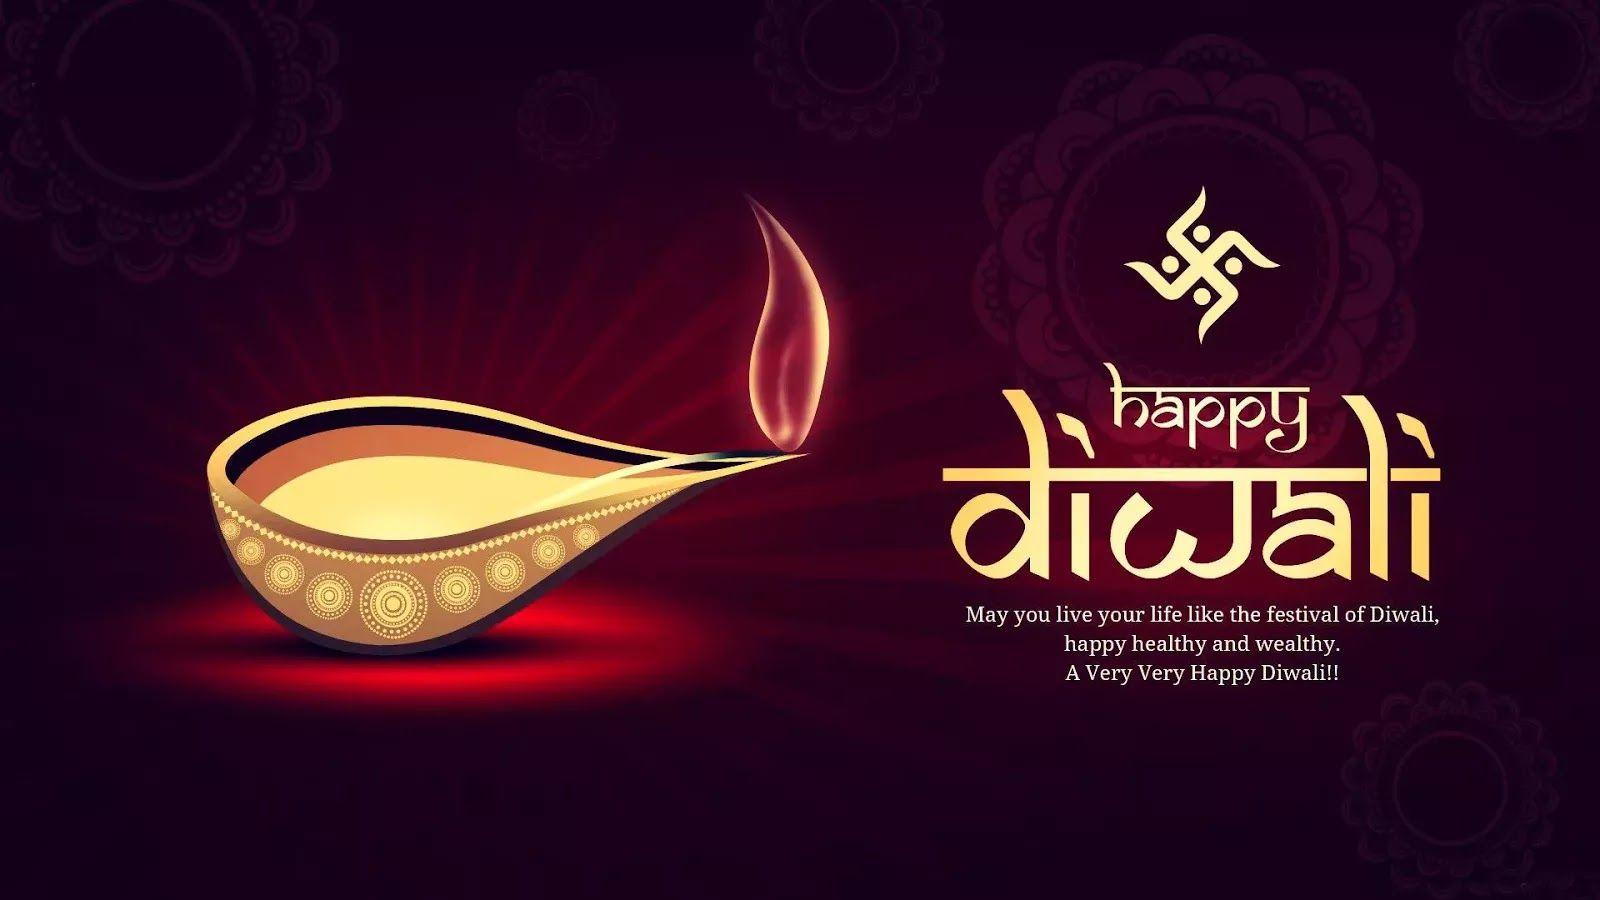 Hd Free Happy Diwali Wallpaper 2016 Happy Diwali 2016 Happy Diwali Wallpapers Diwali Wishes Diwali Message